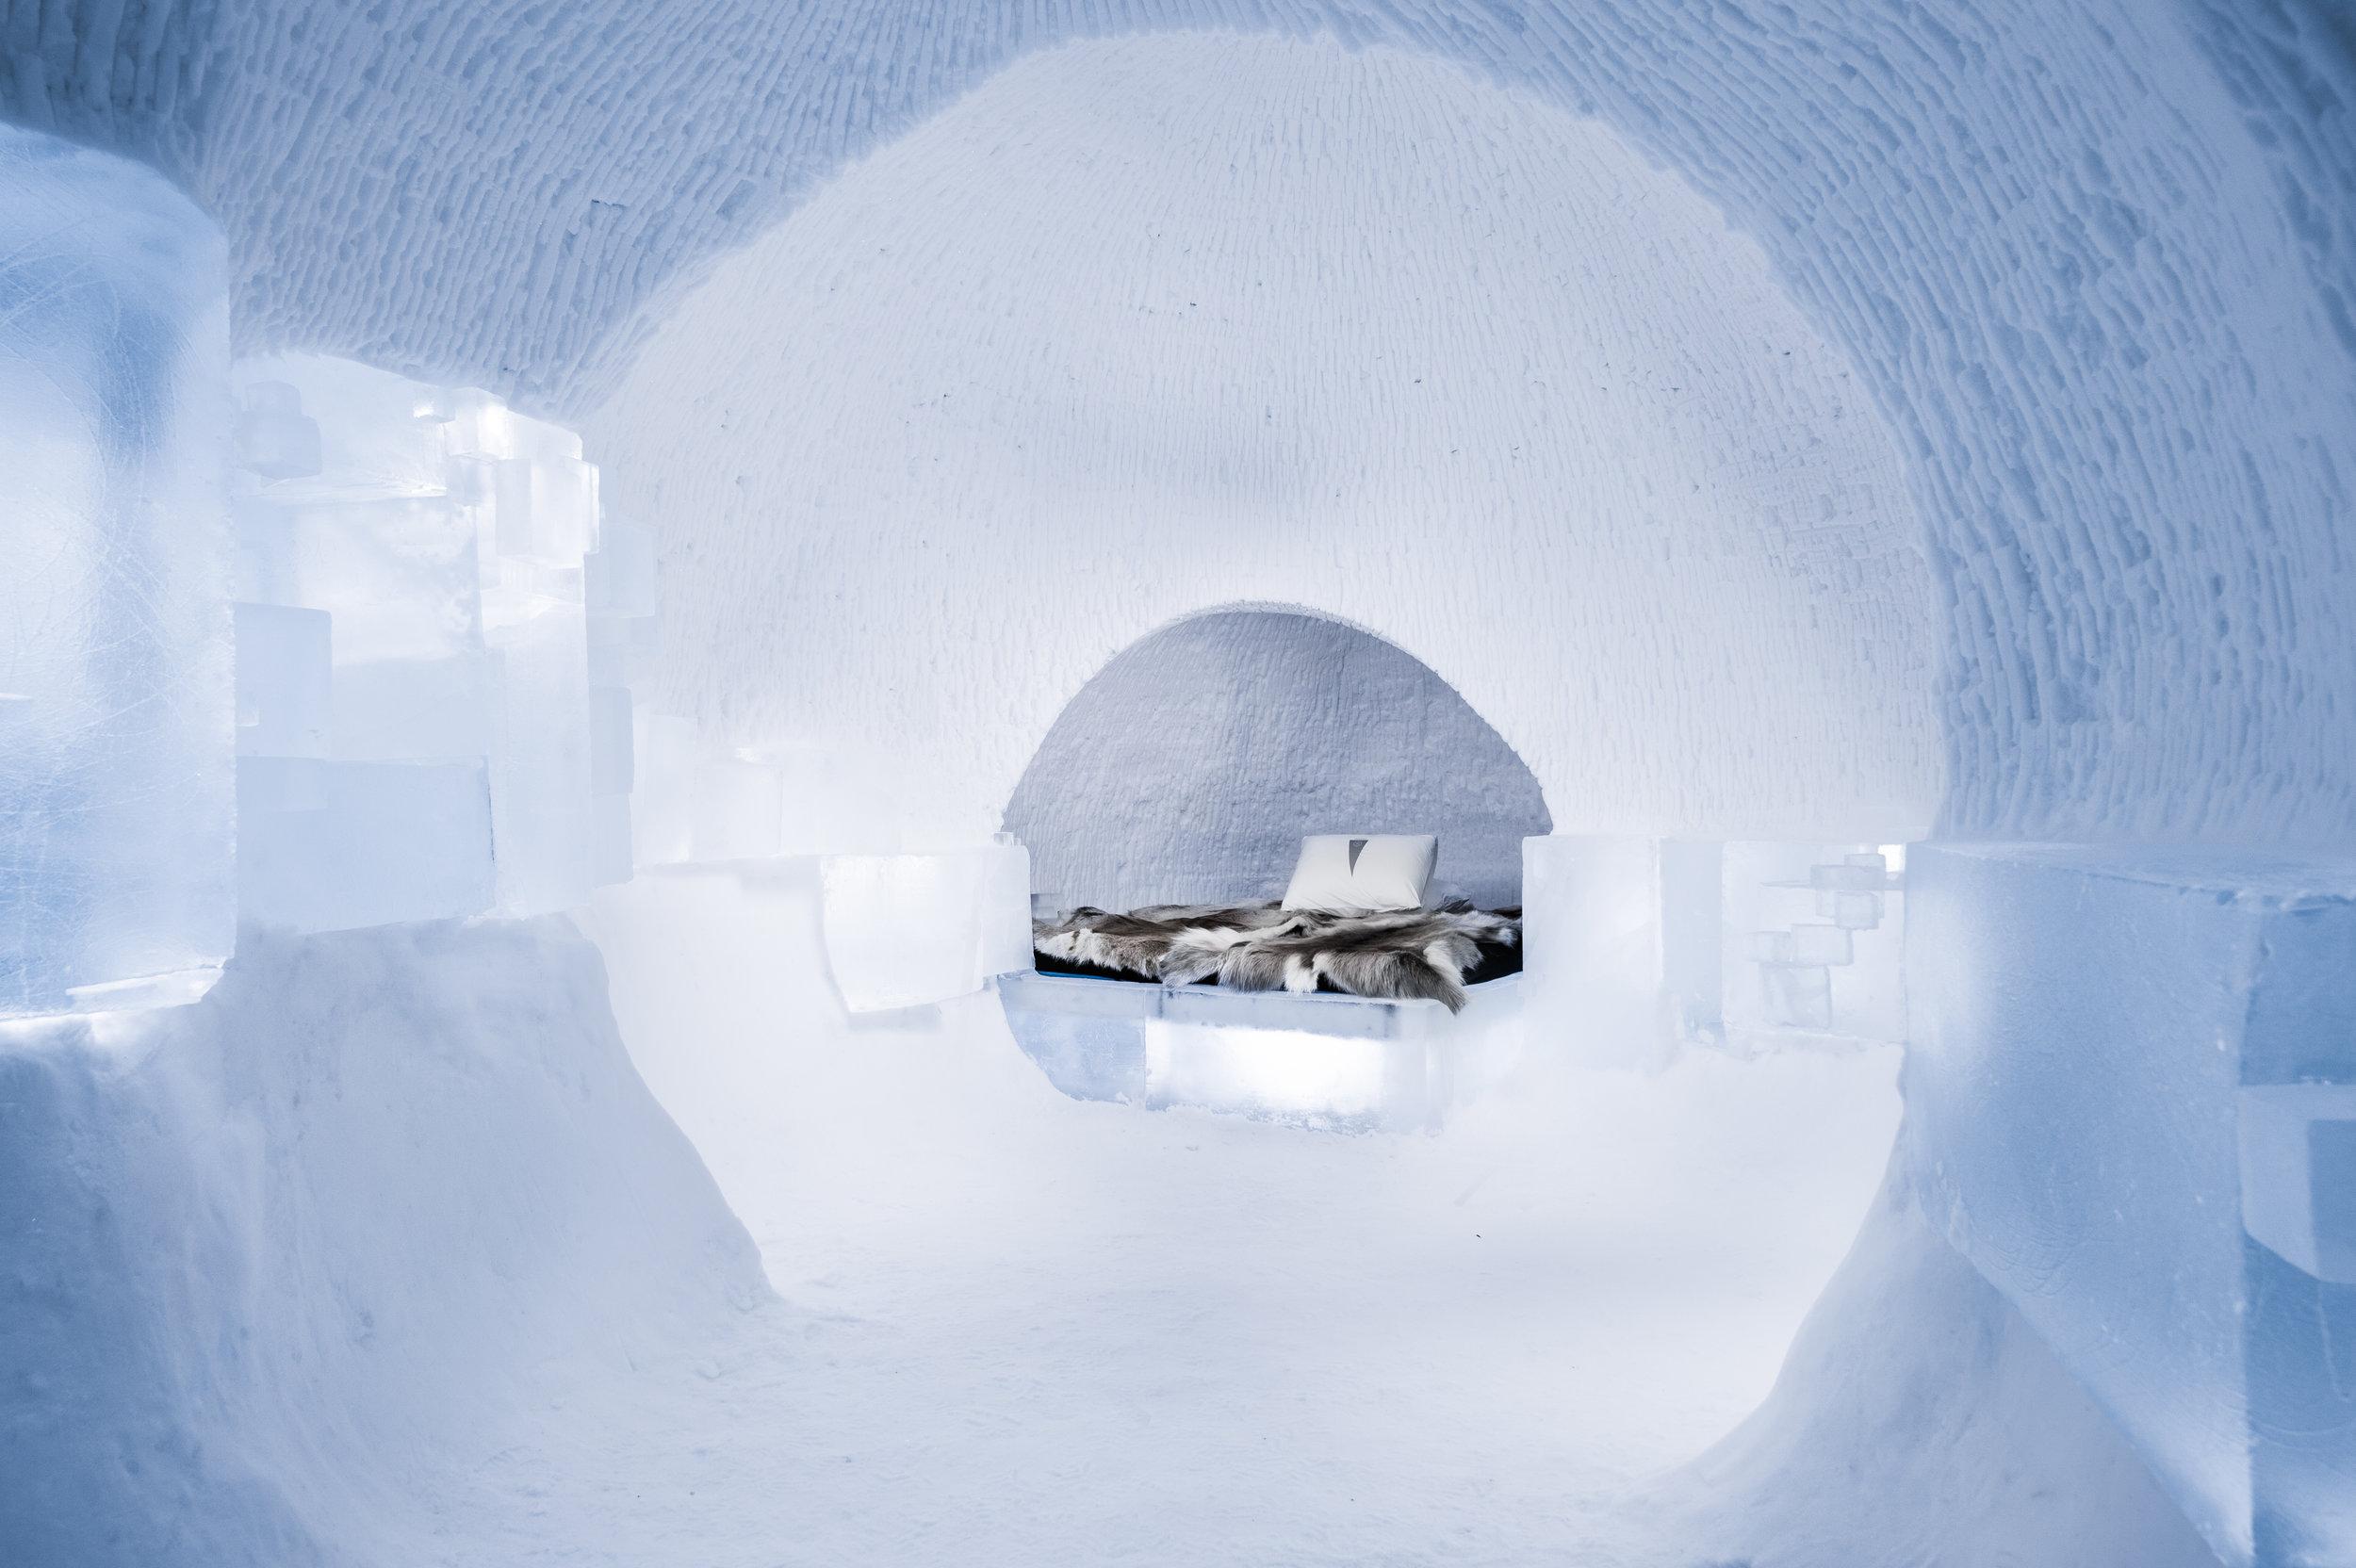 Art suite - A Rich Seam-Howard Miller & Hugh Miller- ICEHOTEL 28  Photo by - Asaf Kliger.jpg